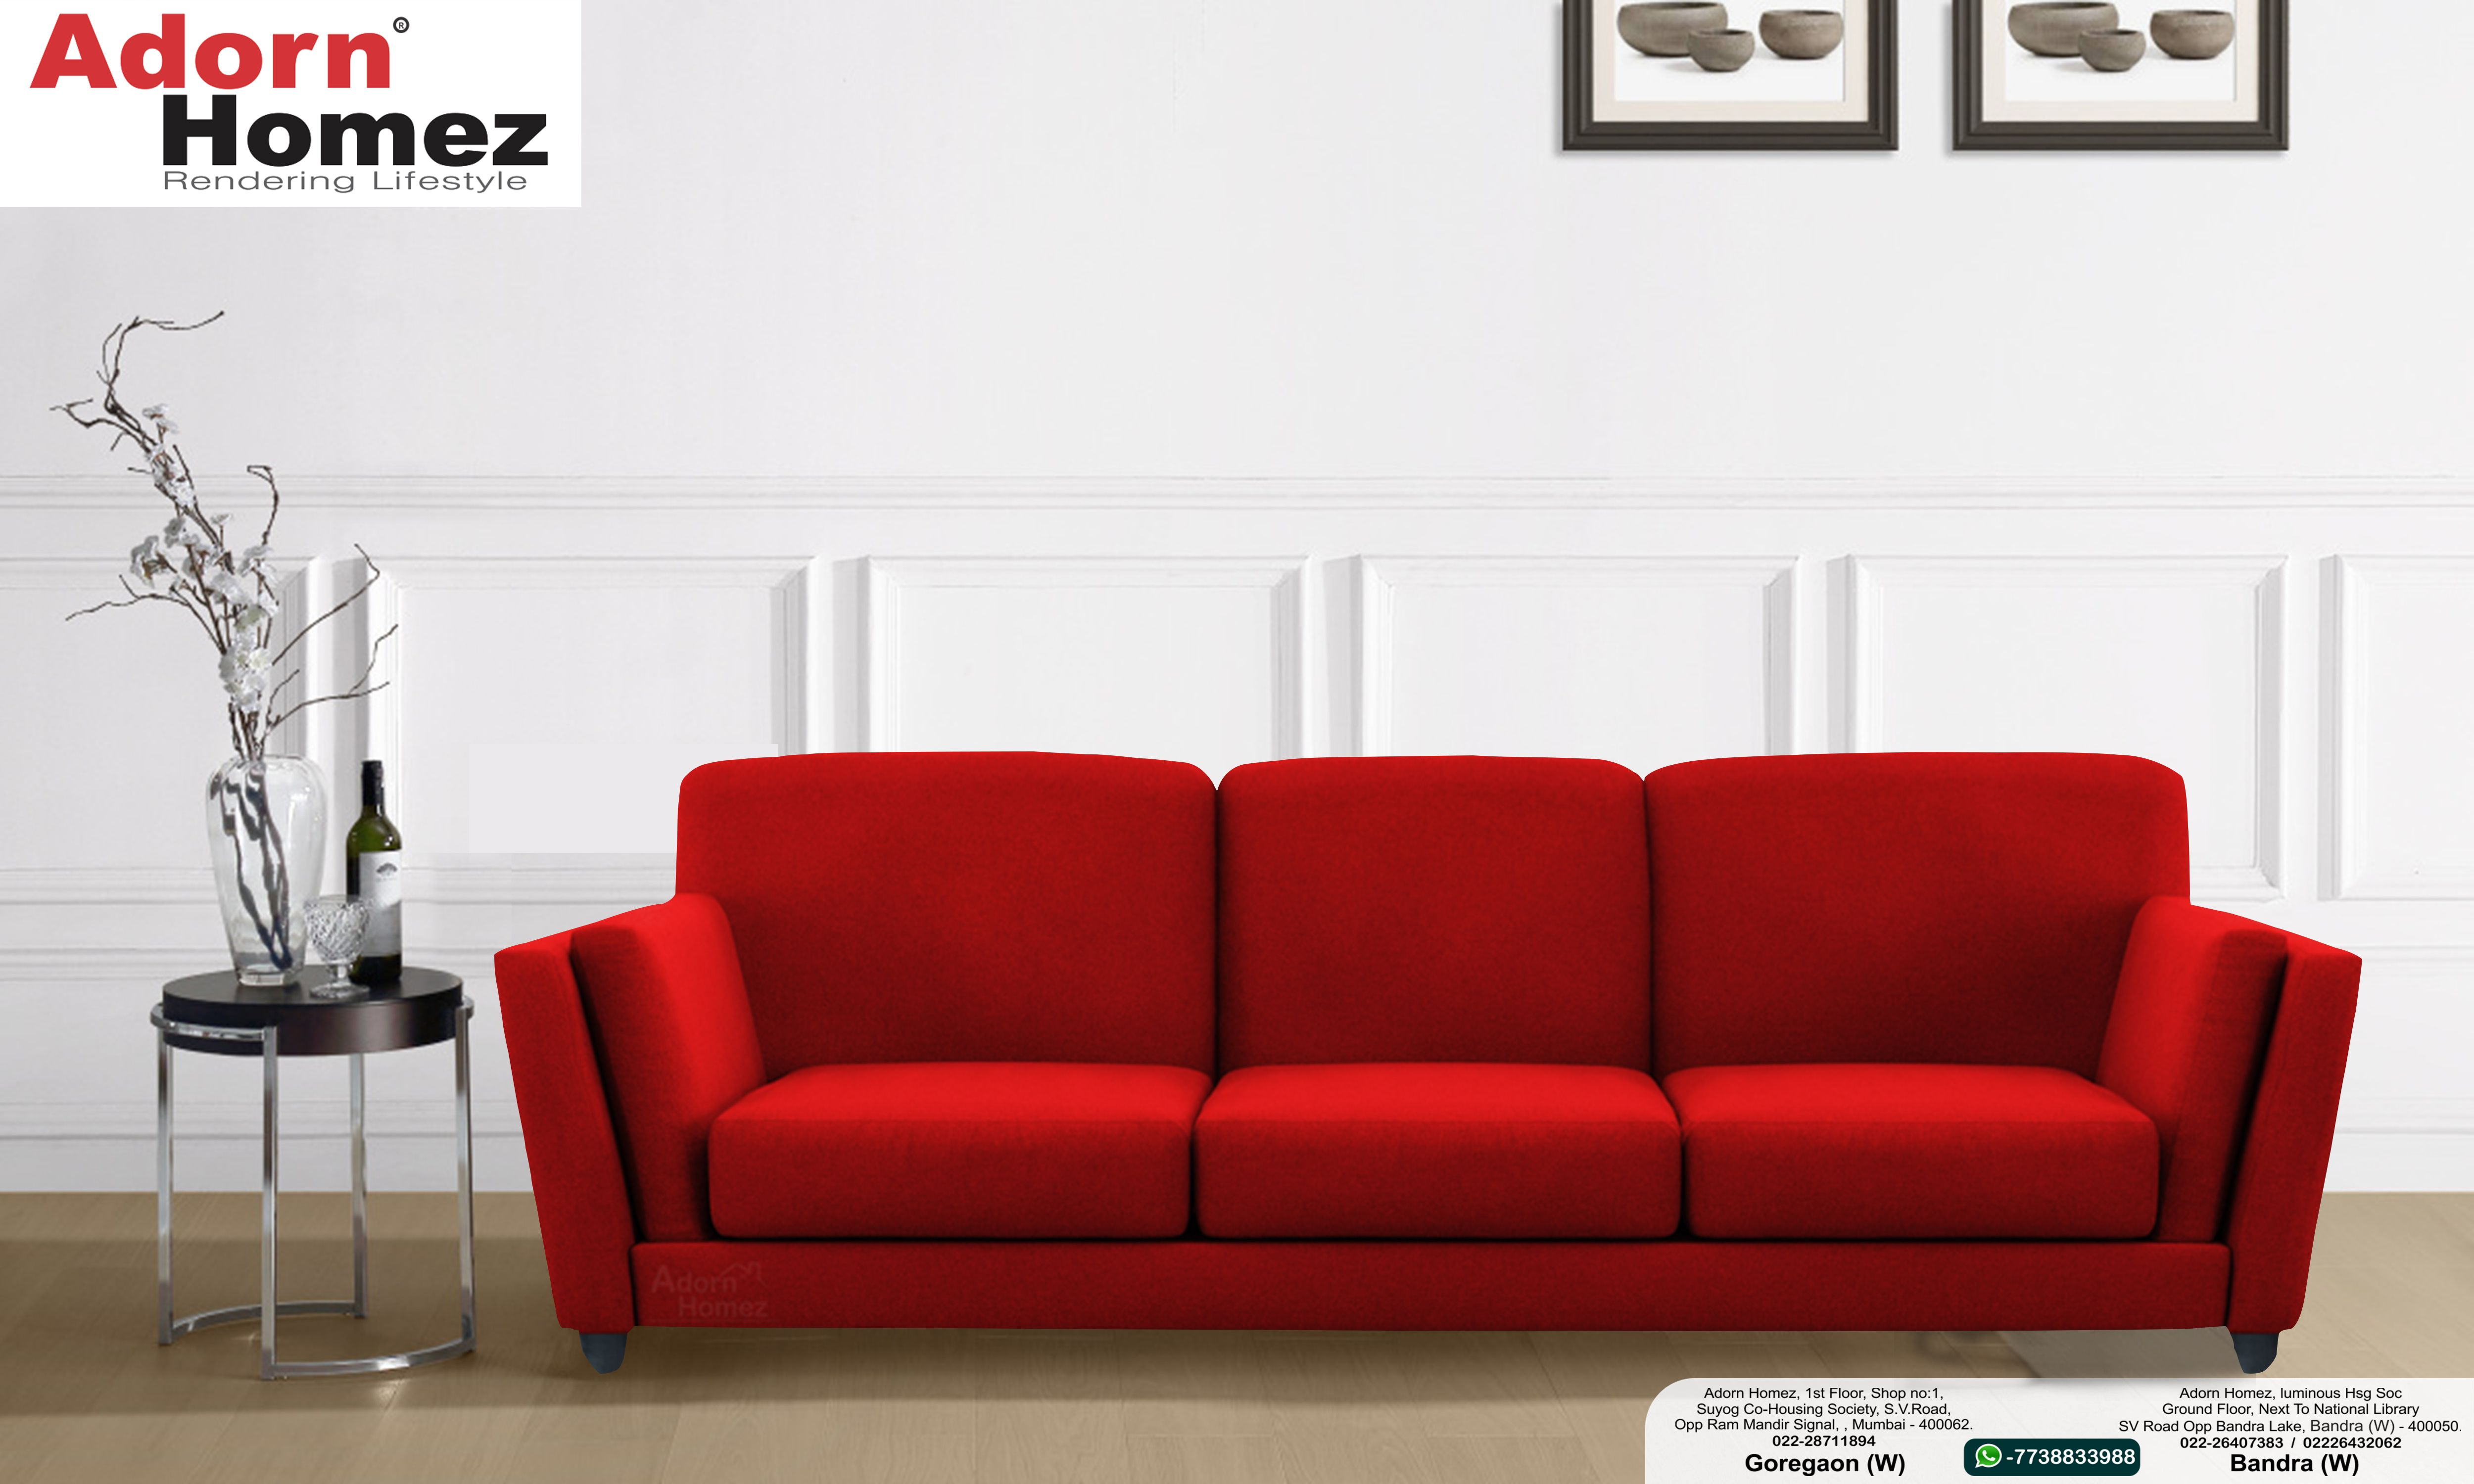 Swell Cabana Fabric 3 Seater Sofa Set By Adorn Homez Red Sofa Inzonedesignstudio Interior Chair Design Inzonedesignstudiocom